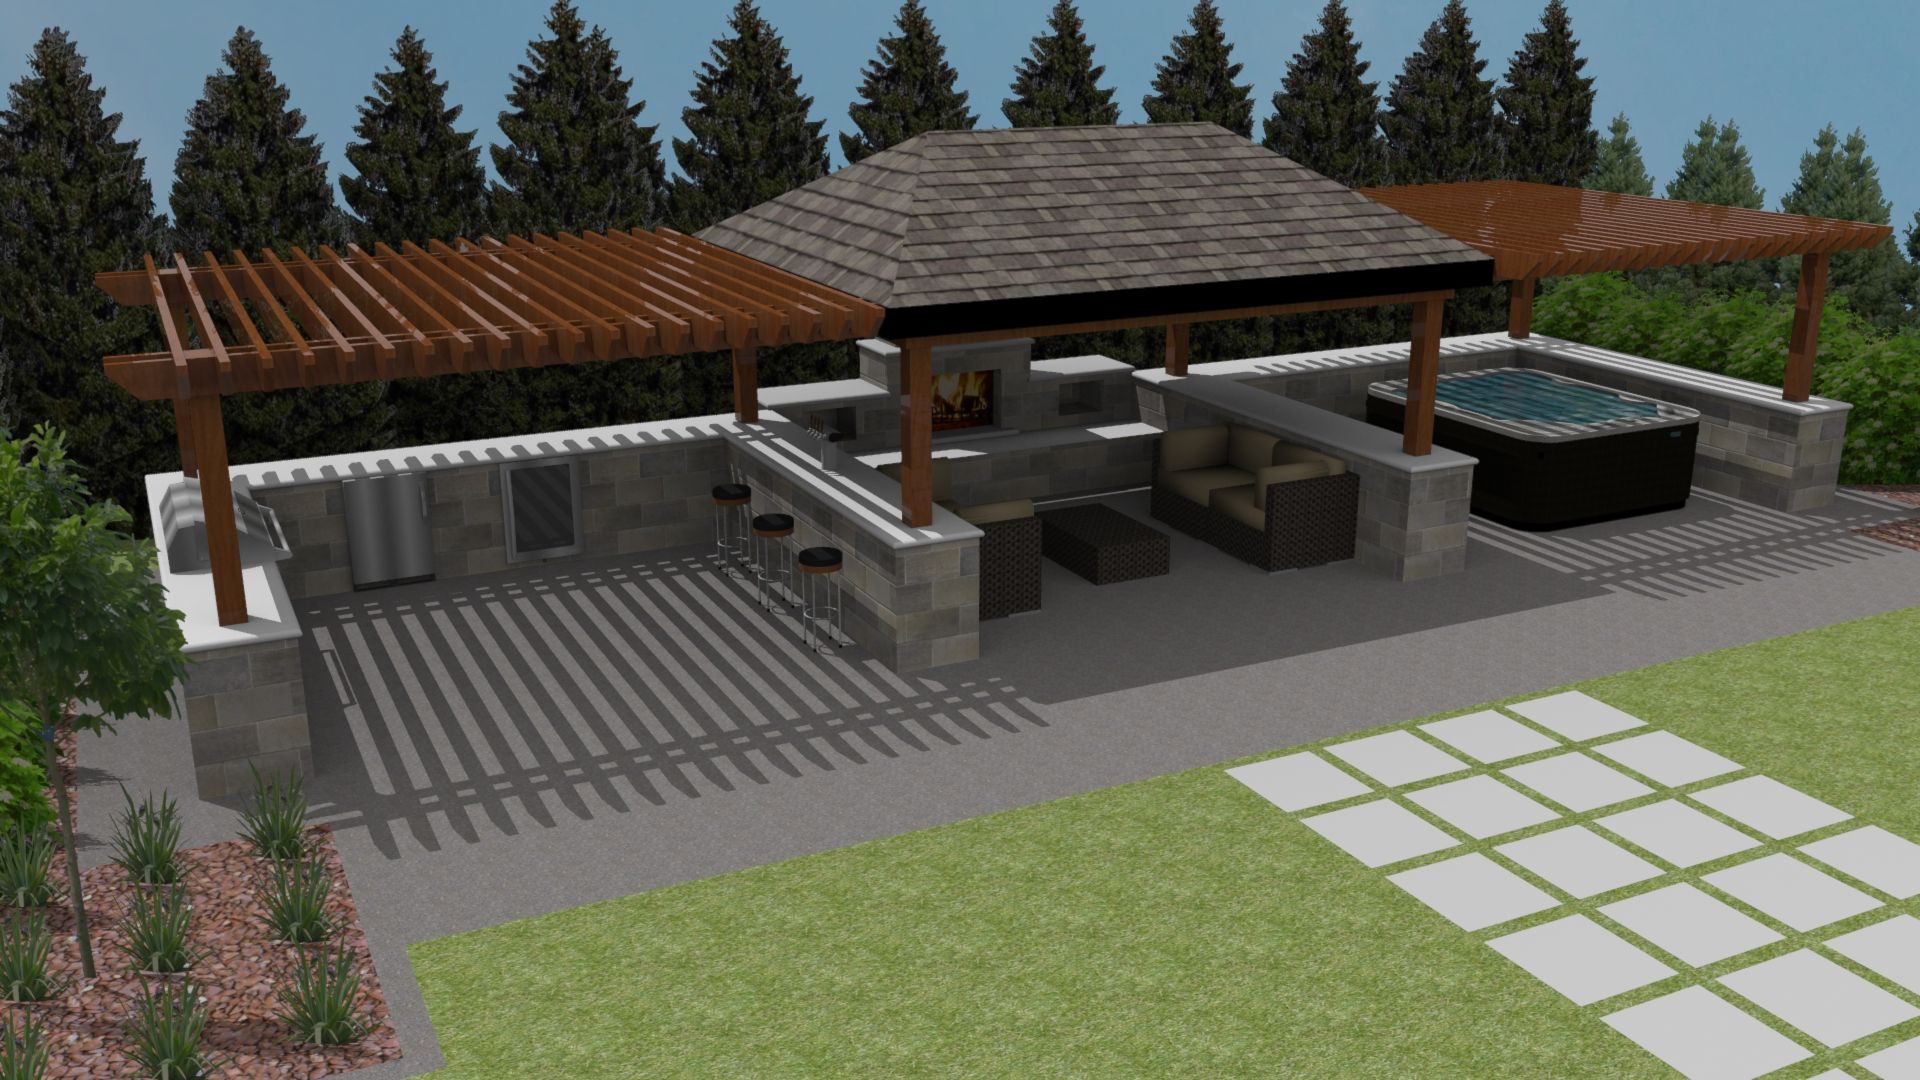 1 Acre Backyard Design Outdoor Furniture Design And Ideas Backyard Entertaining Area Backyard Entertaining Backyard Design